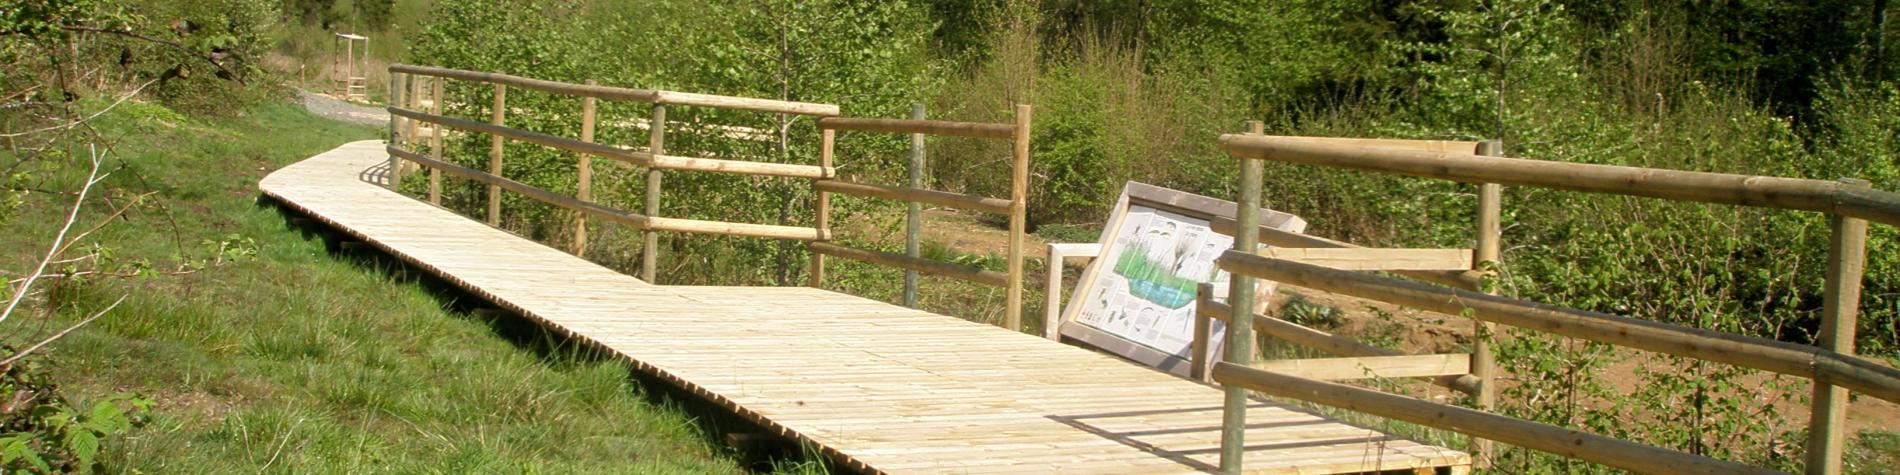 Espace naturel du Sawhis - Havelange - Vue du caillebotis